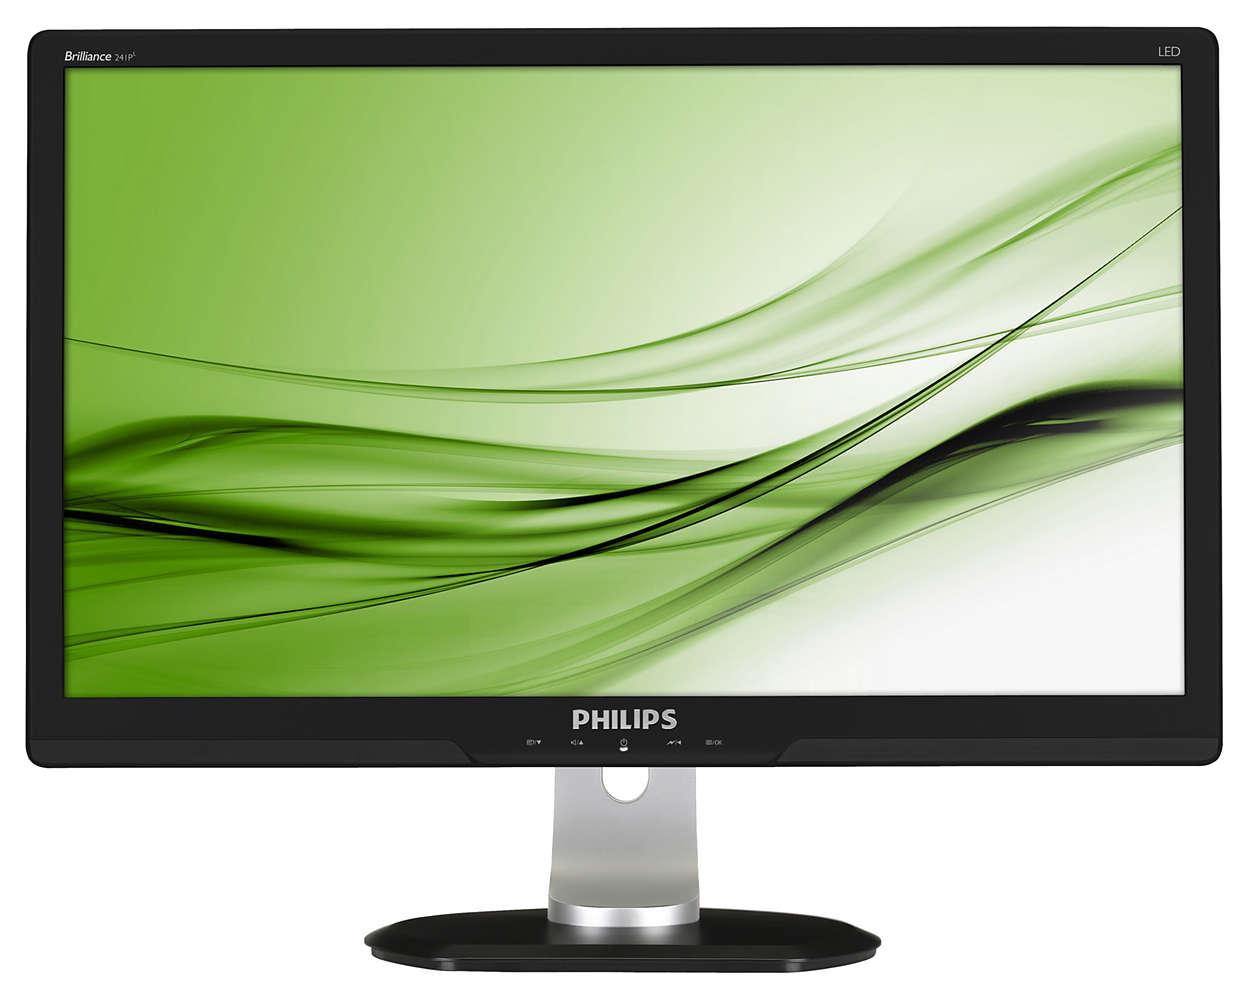 Professionele, productiviteitsverhogende ergonomische monitor